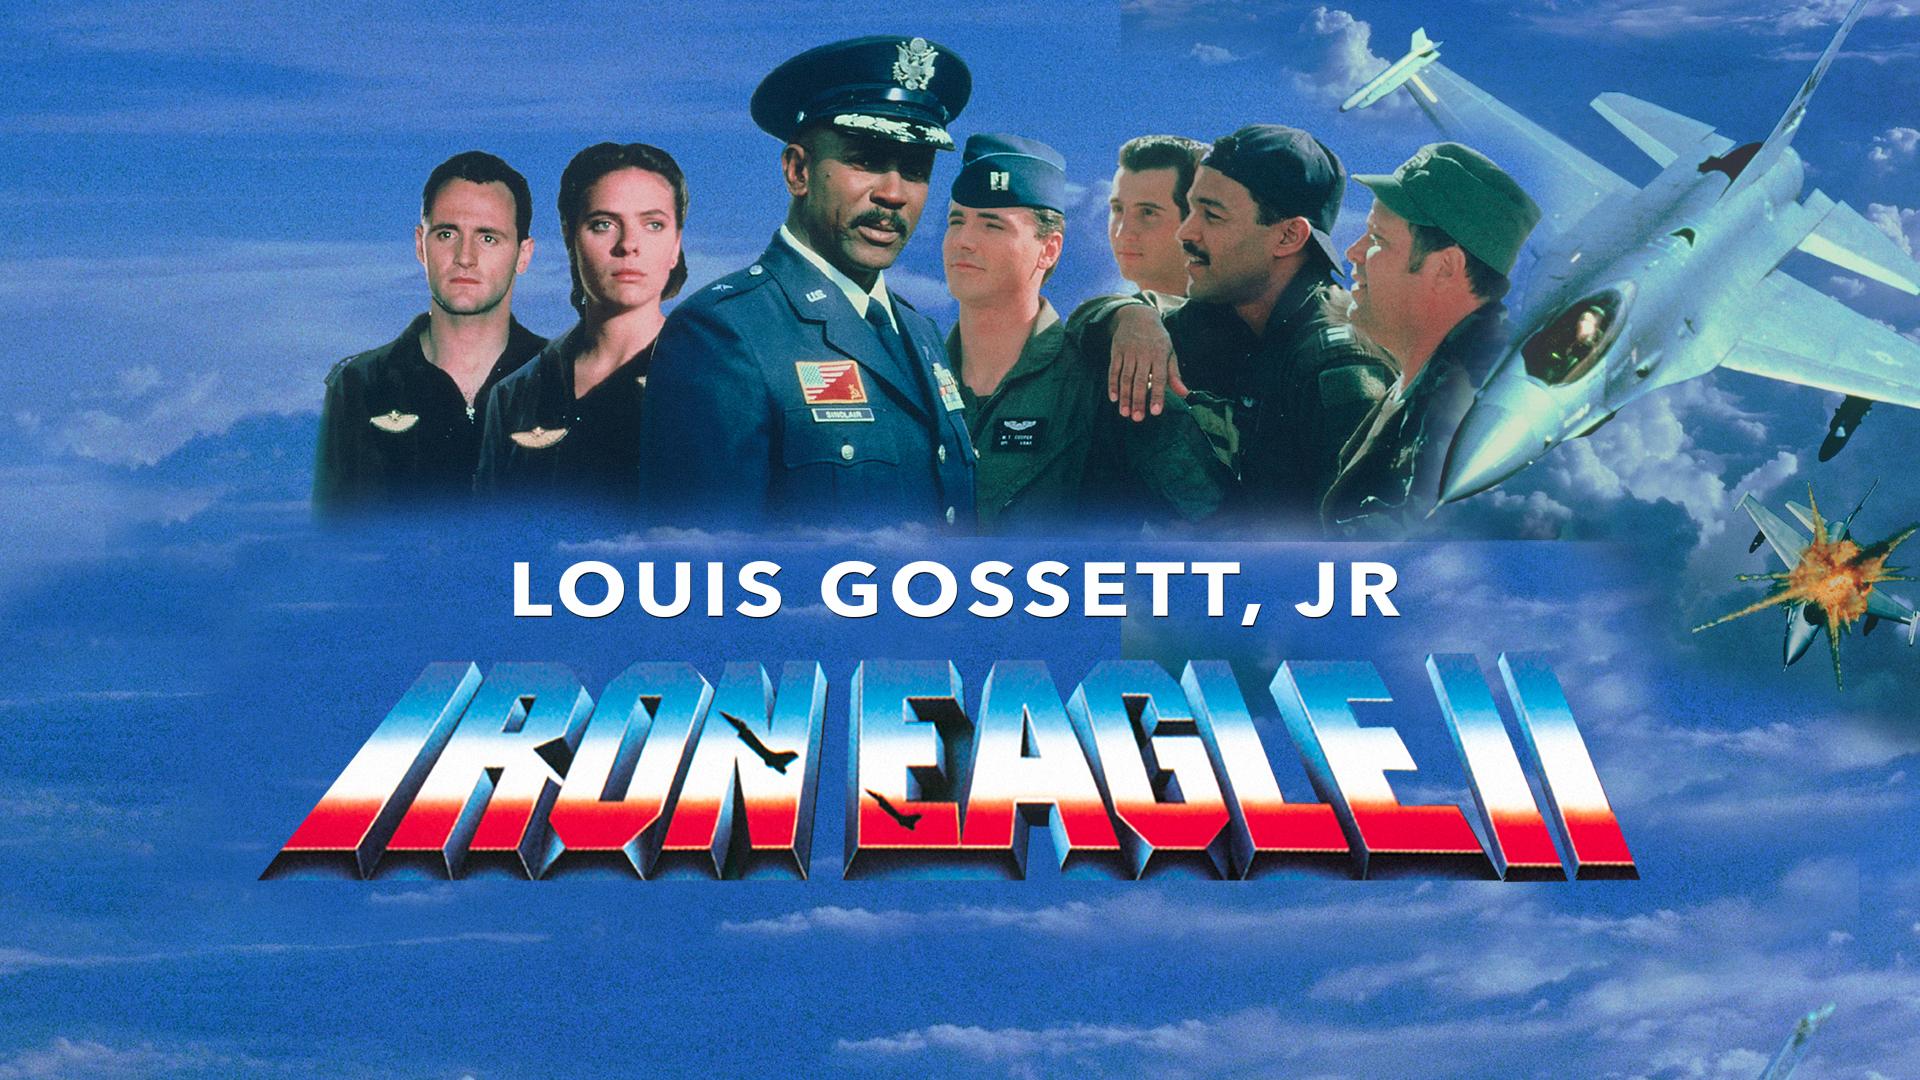 Iron Eagle II (1988) Action, Drama, Romance